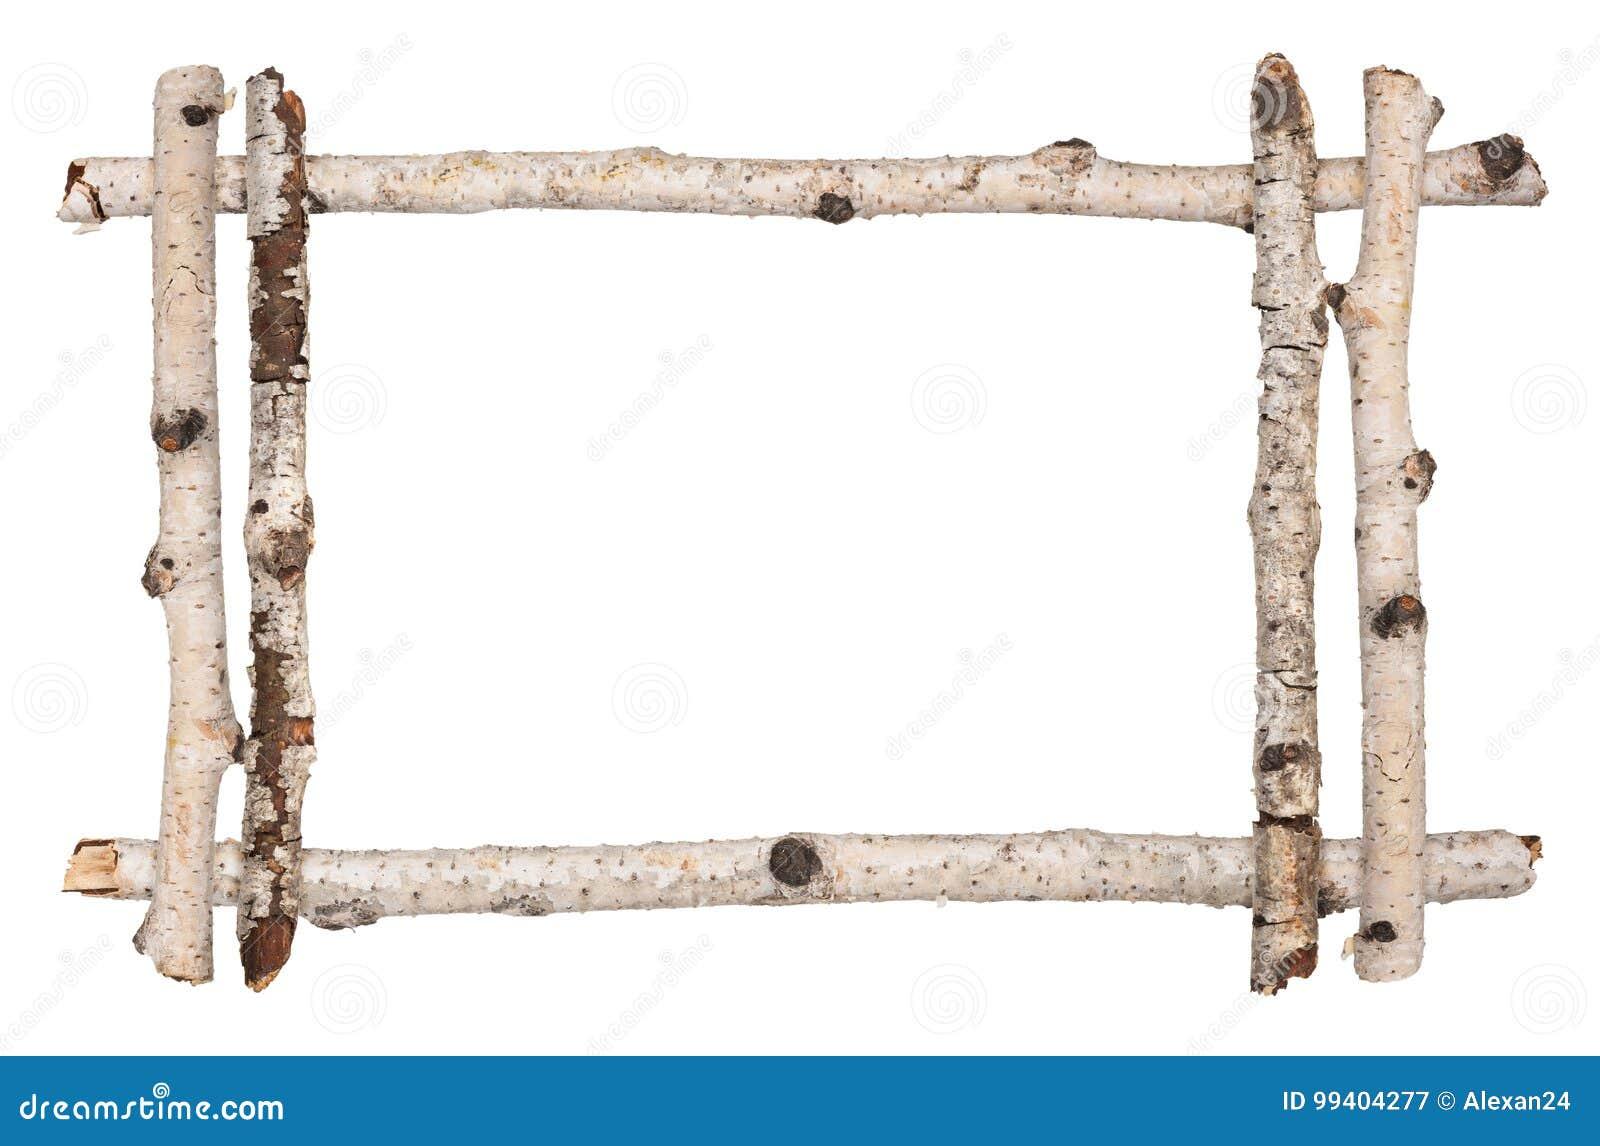 Twig frame of birch stock image. Image of tree, twig - 99404277